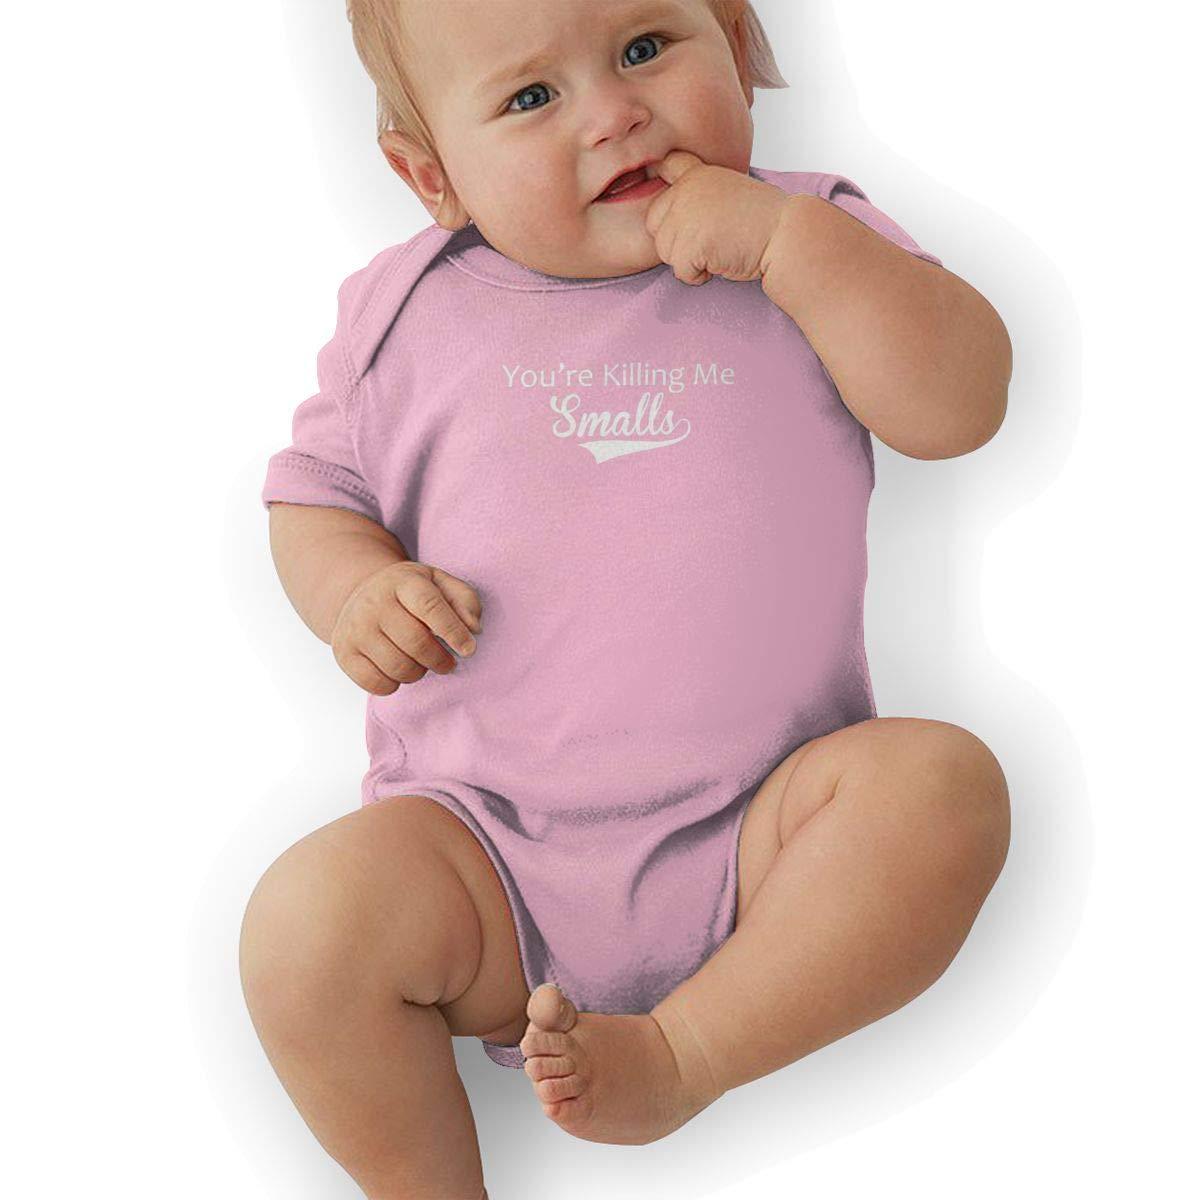 Dfenere Youre Killin Me Smalls Logo Fashion Newborn Baby Short Sleeve Bodysuit Romper Infant Summer Clothing